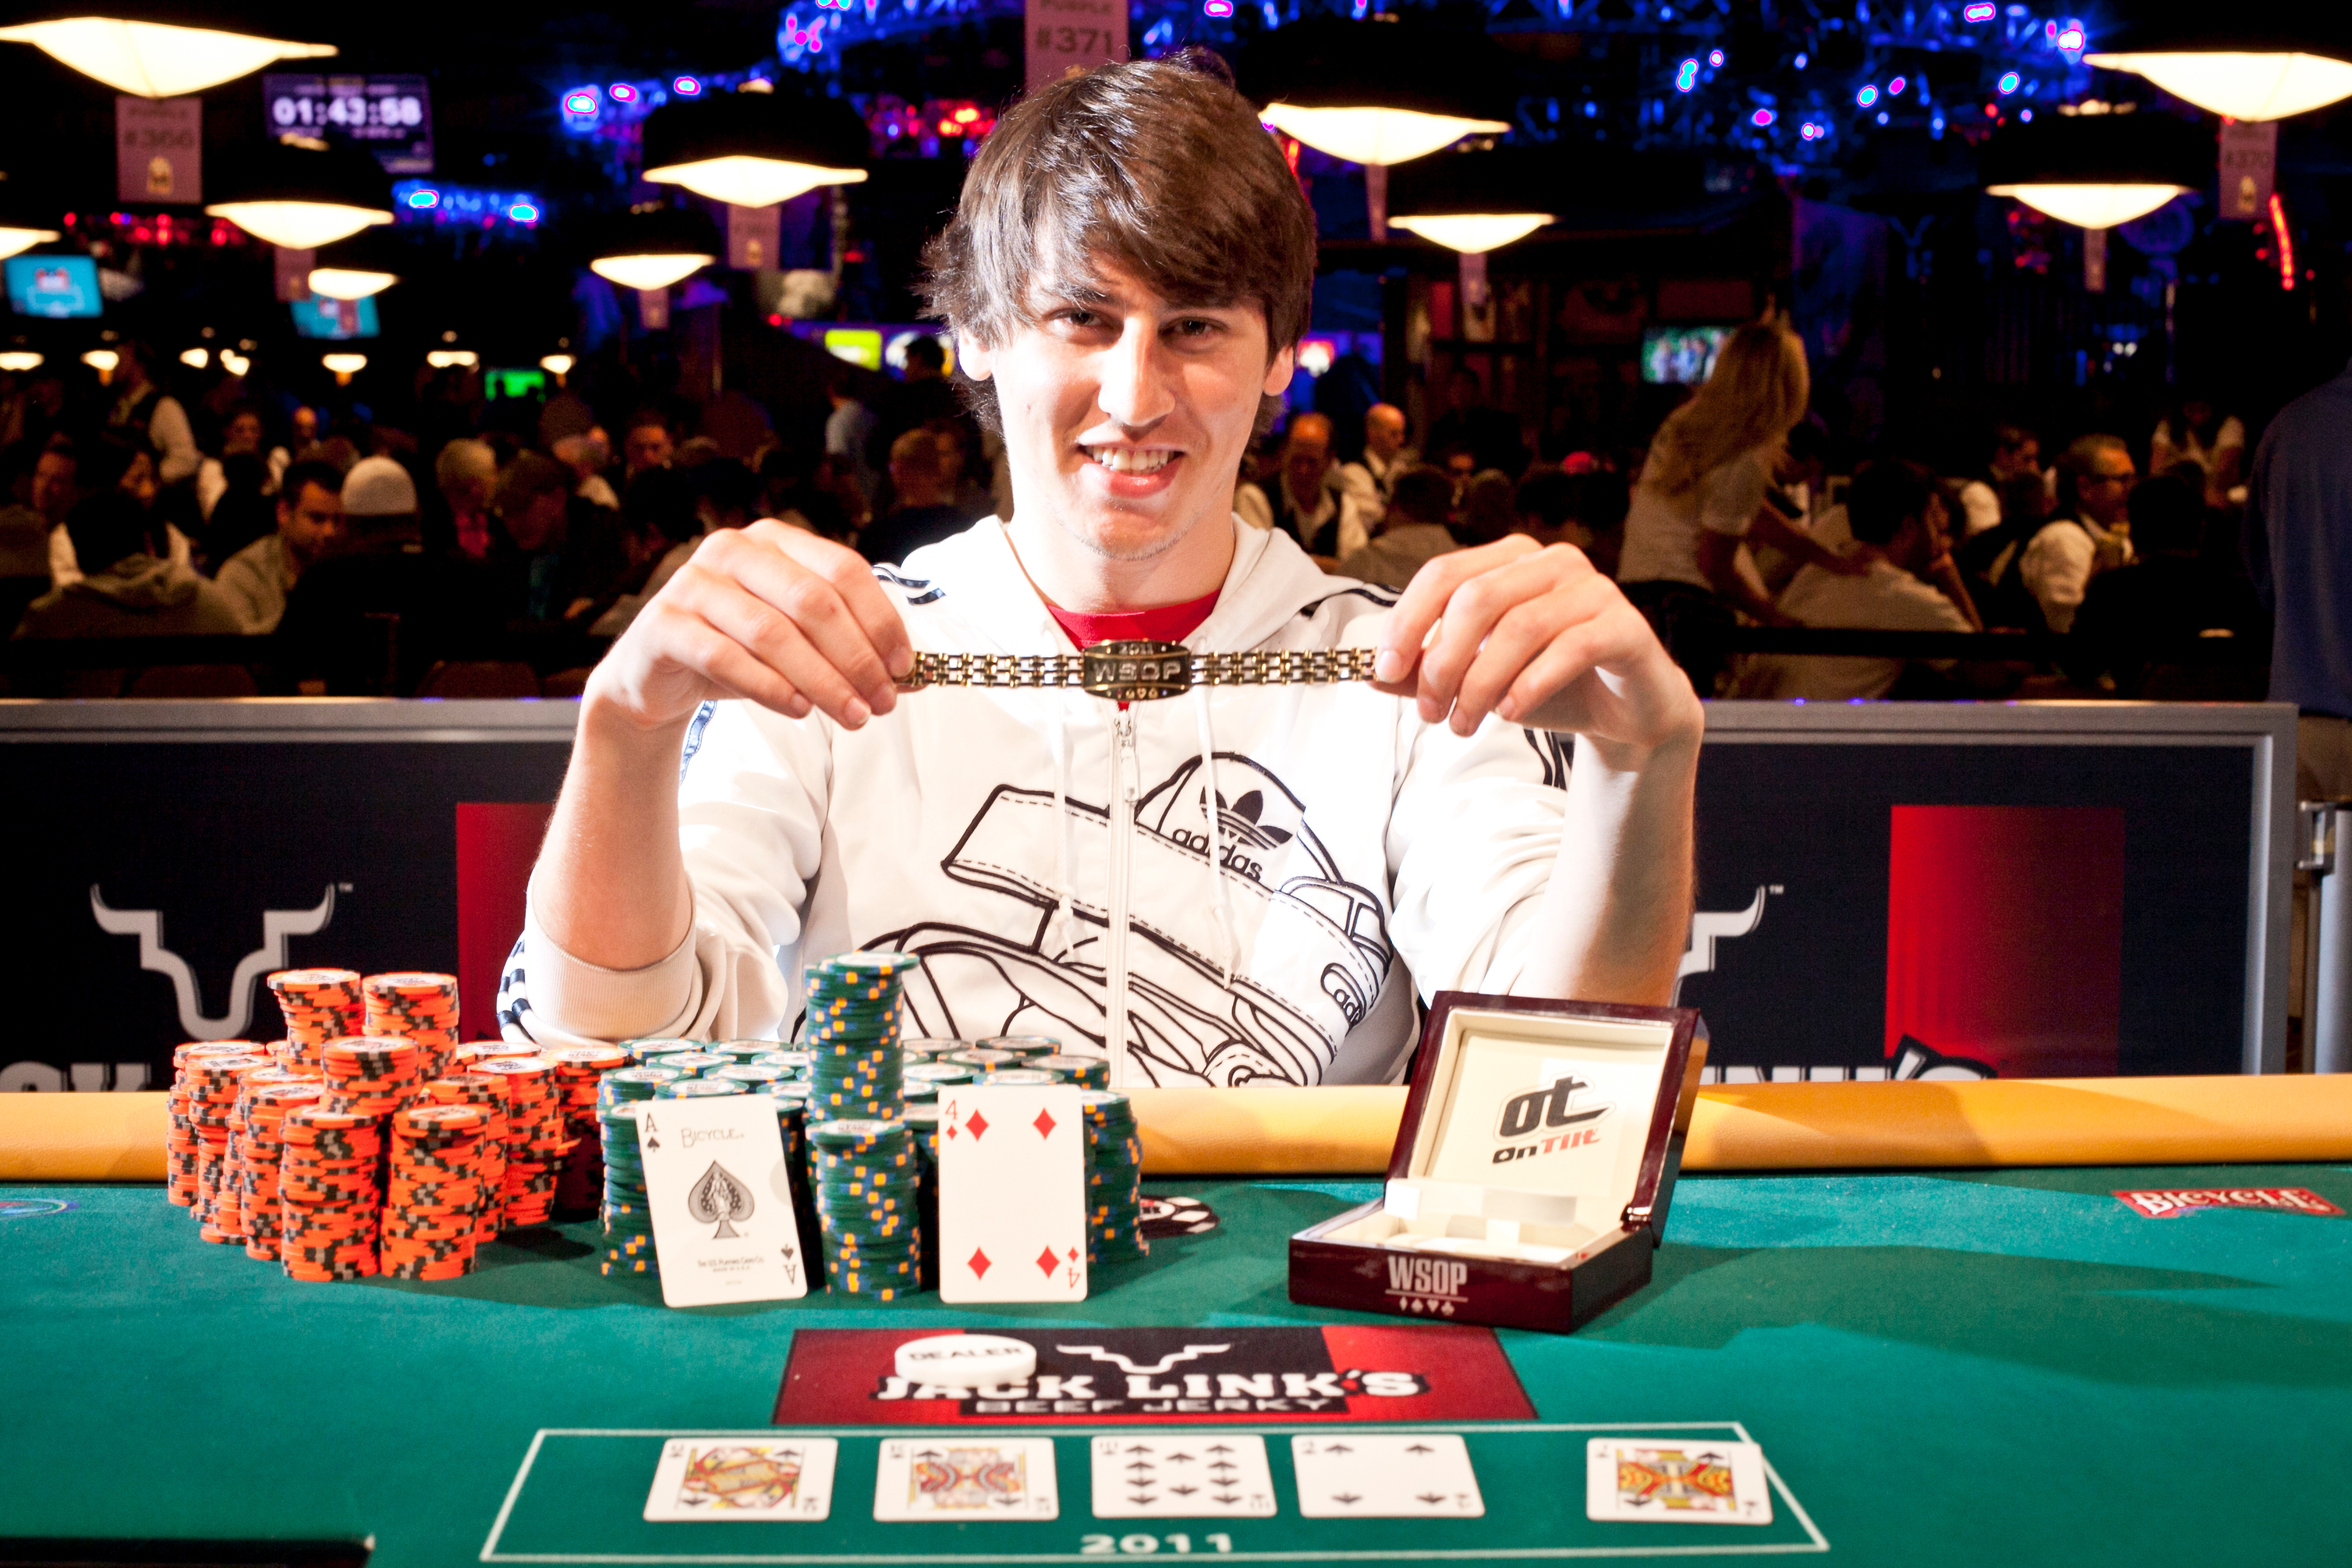 Defend blackjack latex gloves